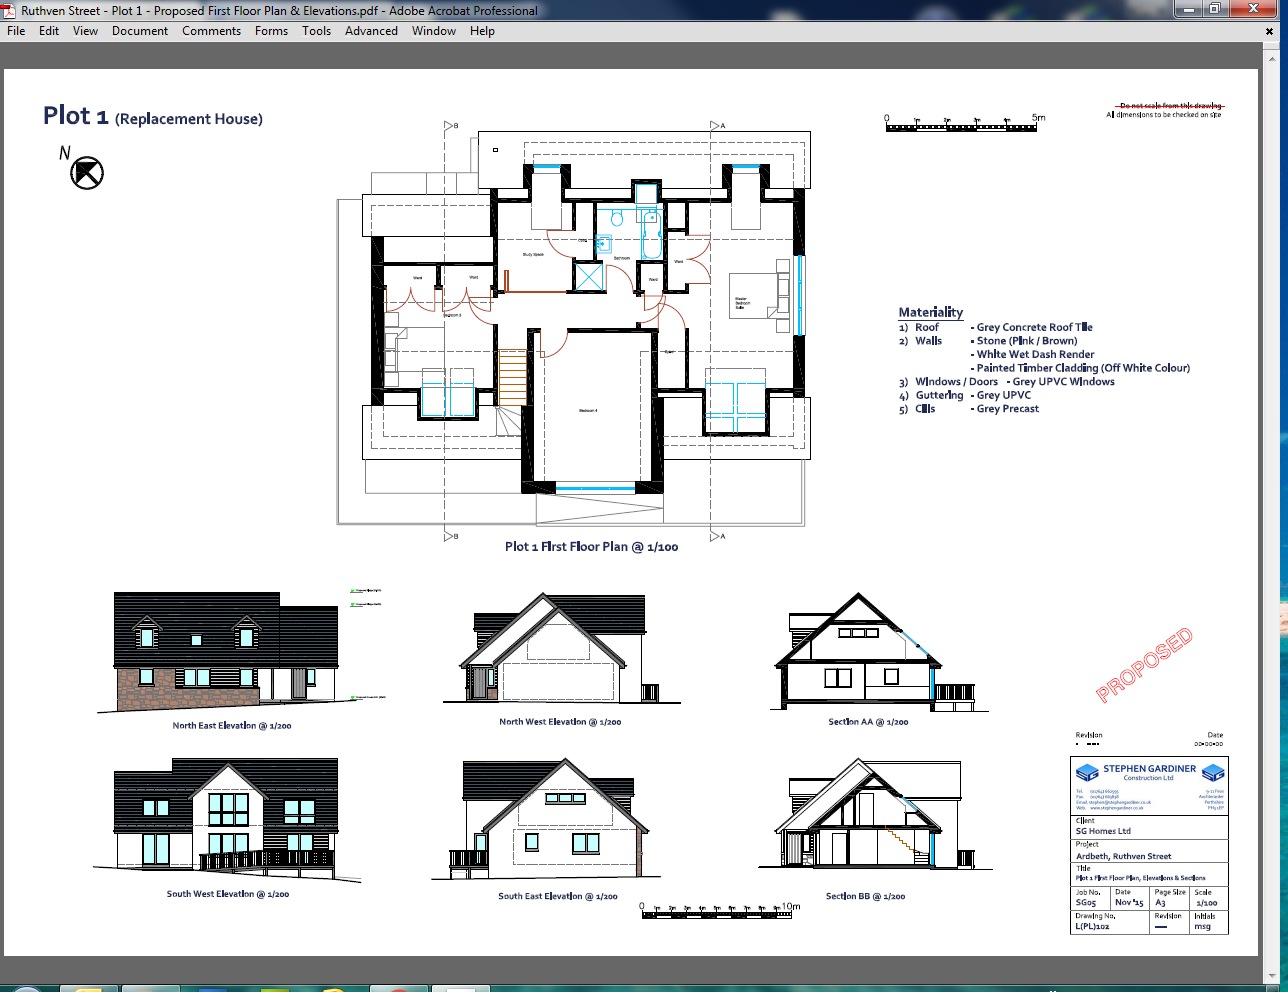 Ruthven Street - Plot 1 - Proposed Ground Floor Plan